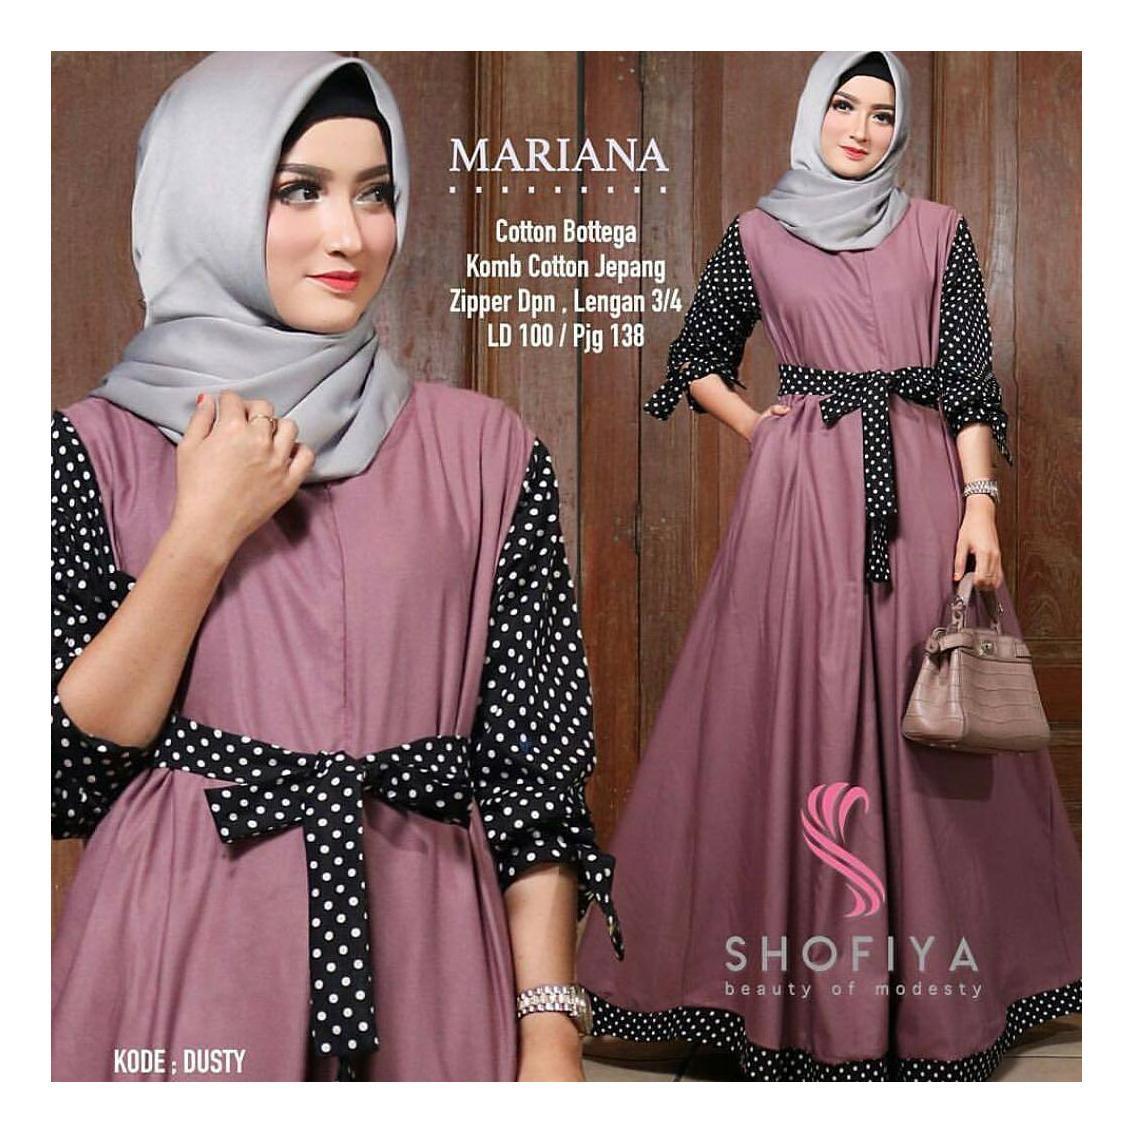 OEM Baju Original Mariana Polka Dress Balotely Gamis Panjang Wanita Muslim  Pakaian Cewek Gaun Muslimah Hijab 831a6c7fbe